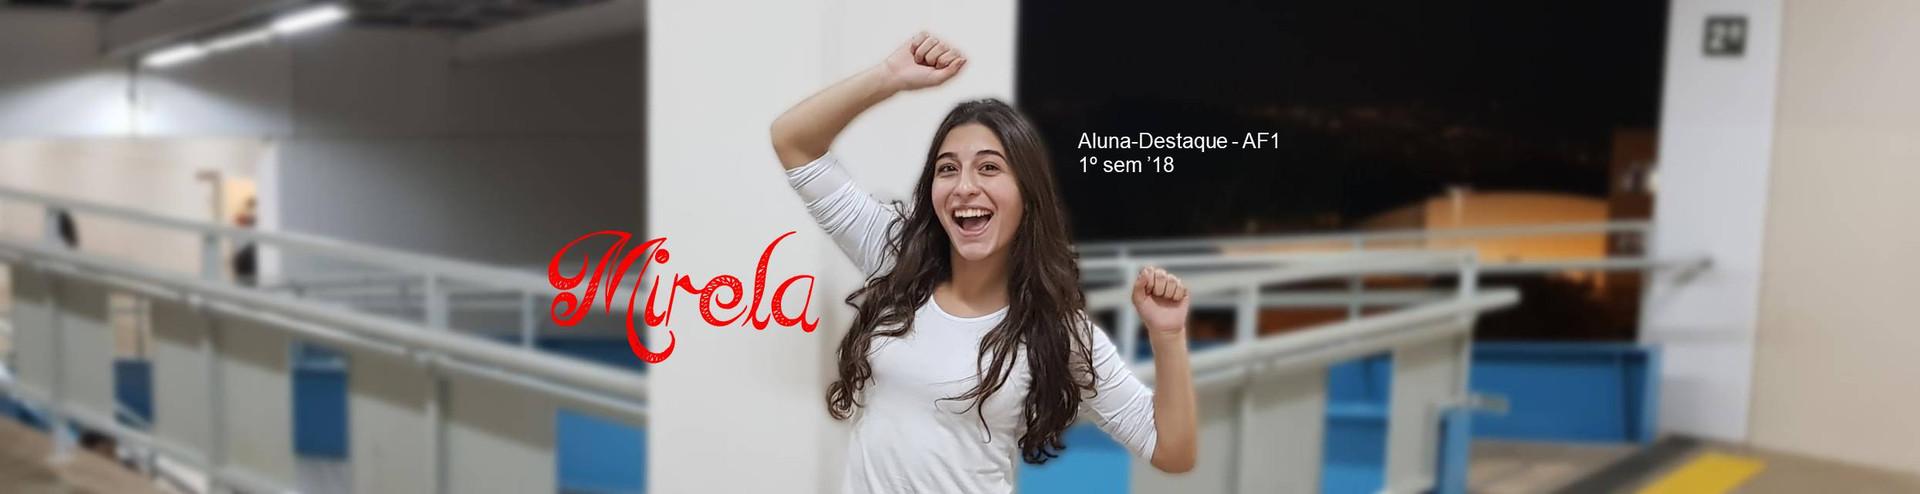 2018 - 1º semestre